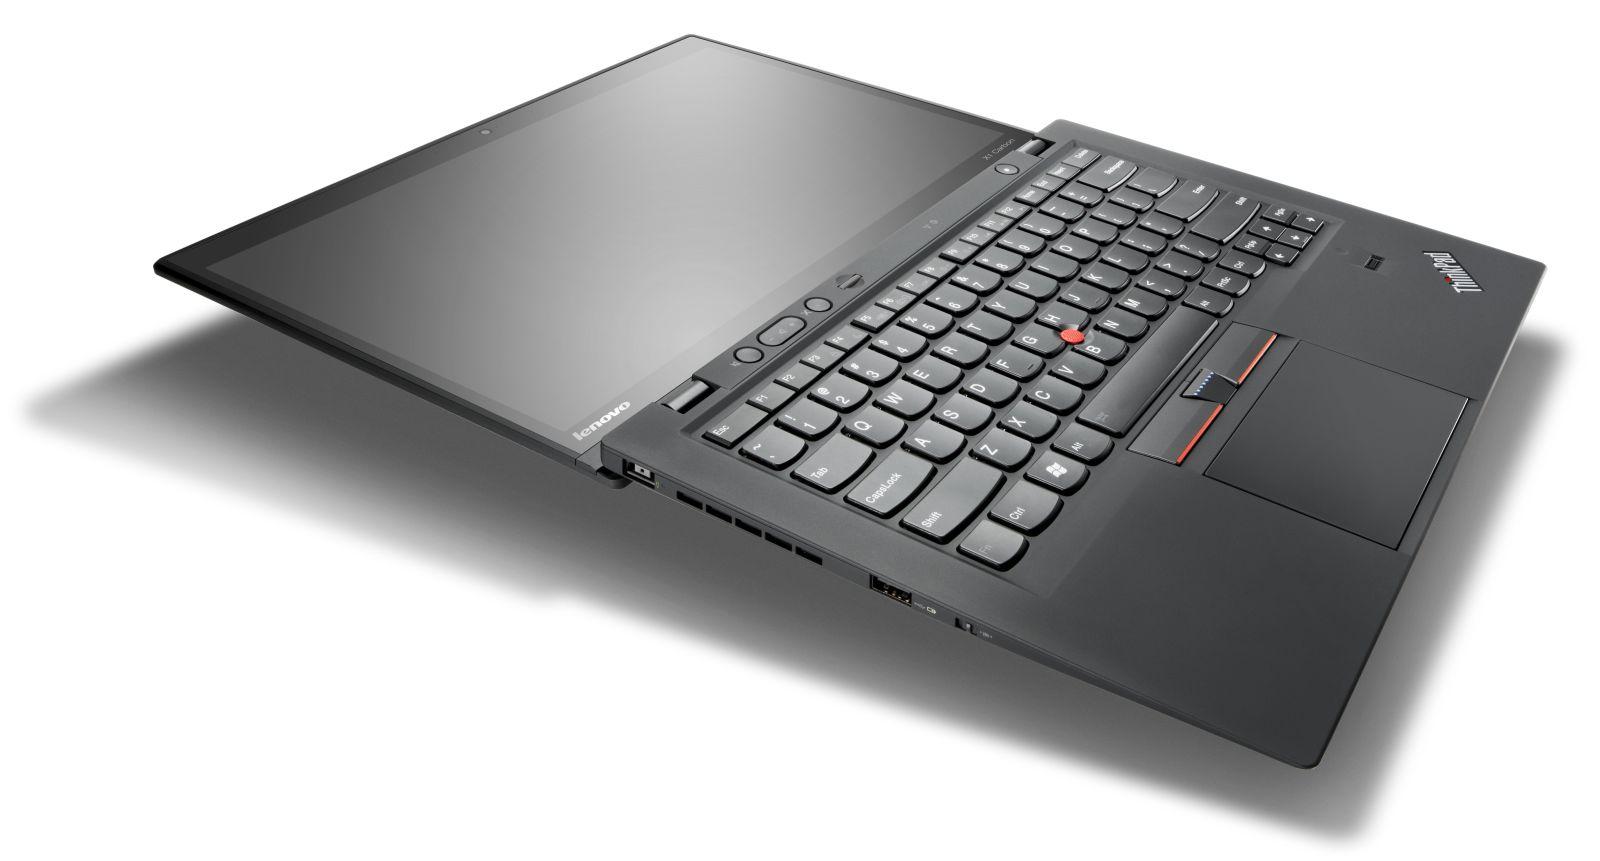 Lenovo ThinkPad X1 Carbon